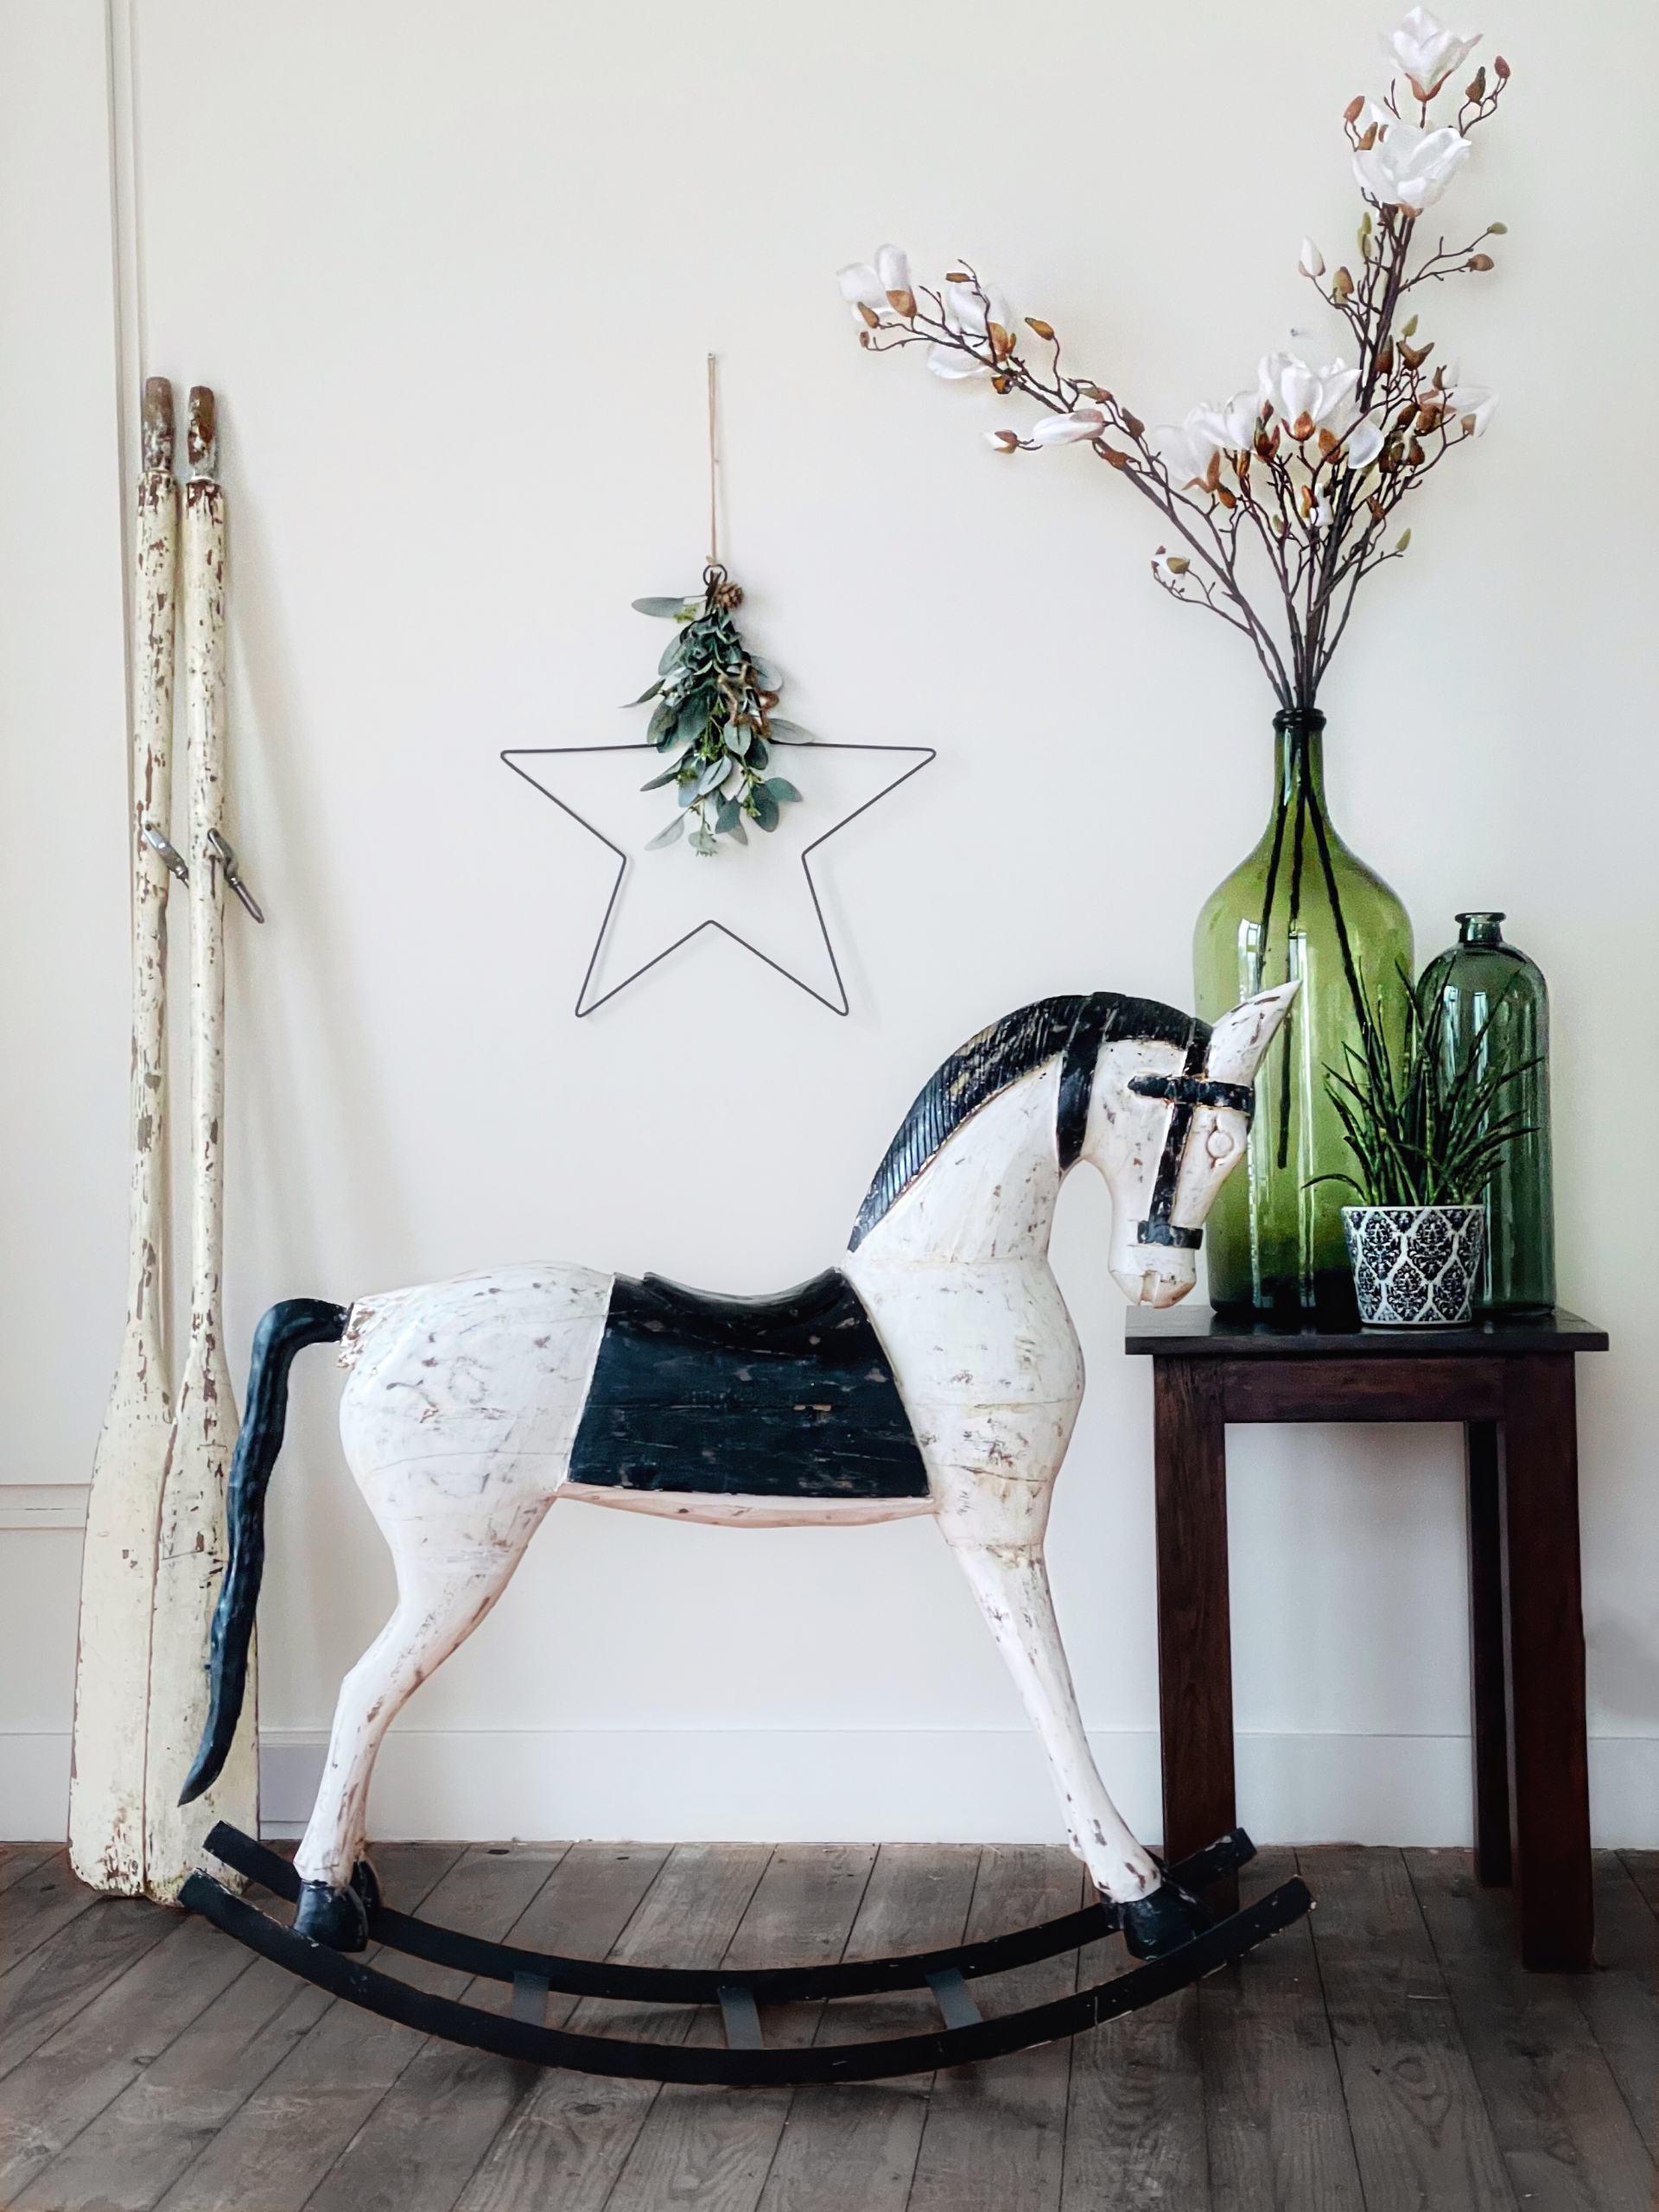 Decorative Vintage Rocking Horse – XL